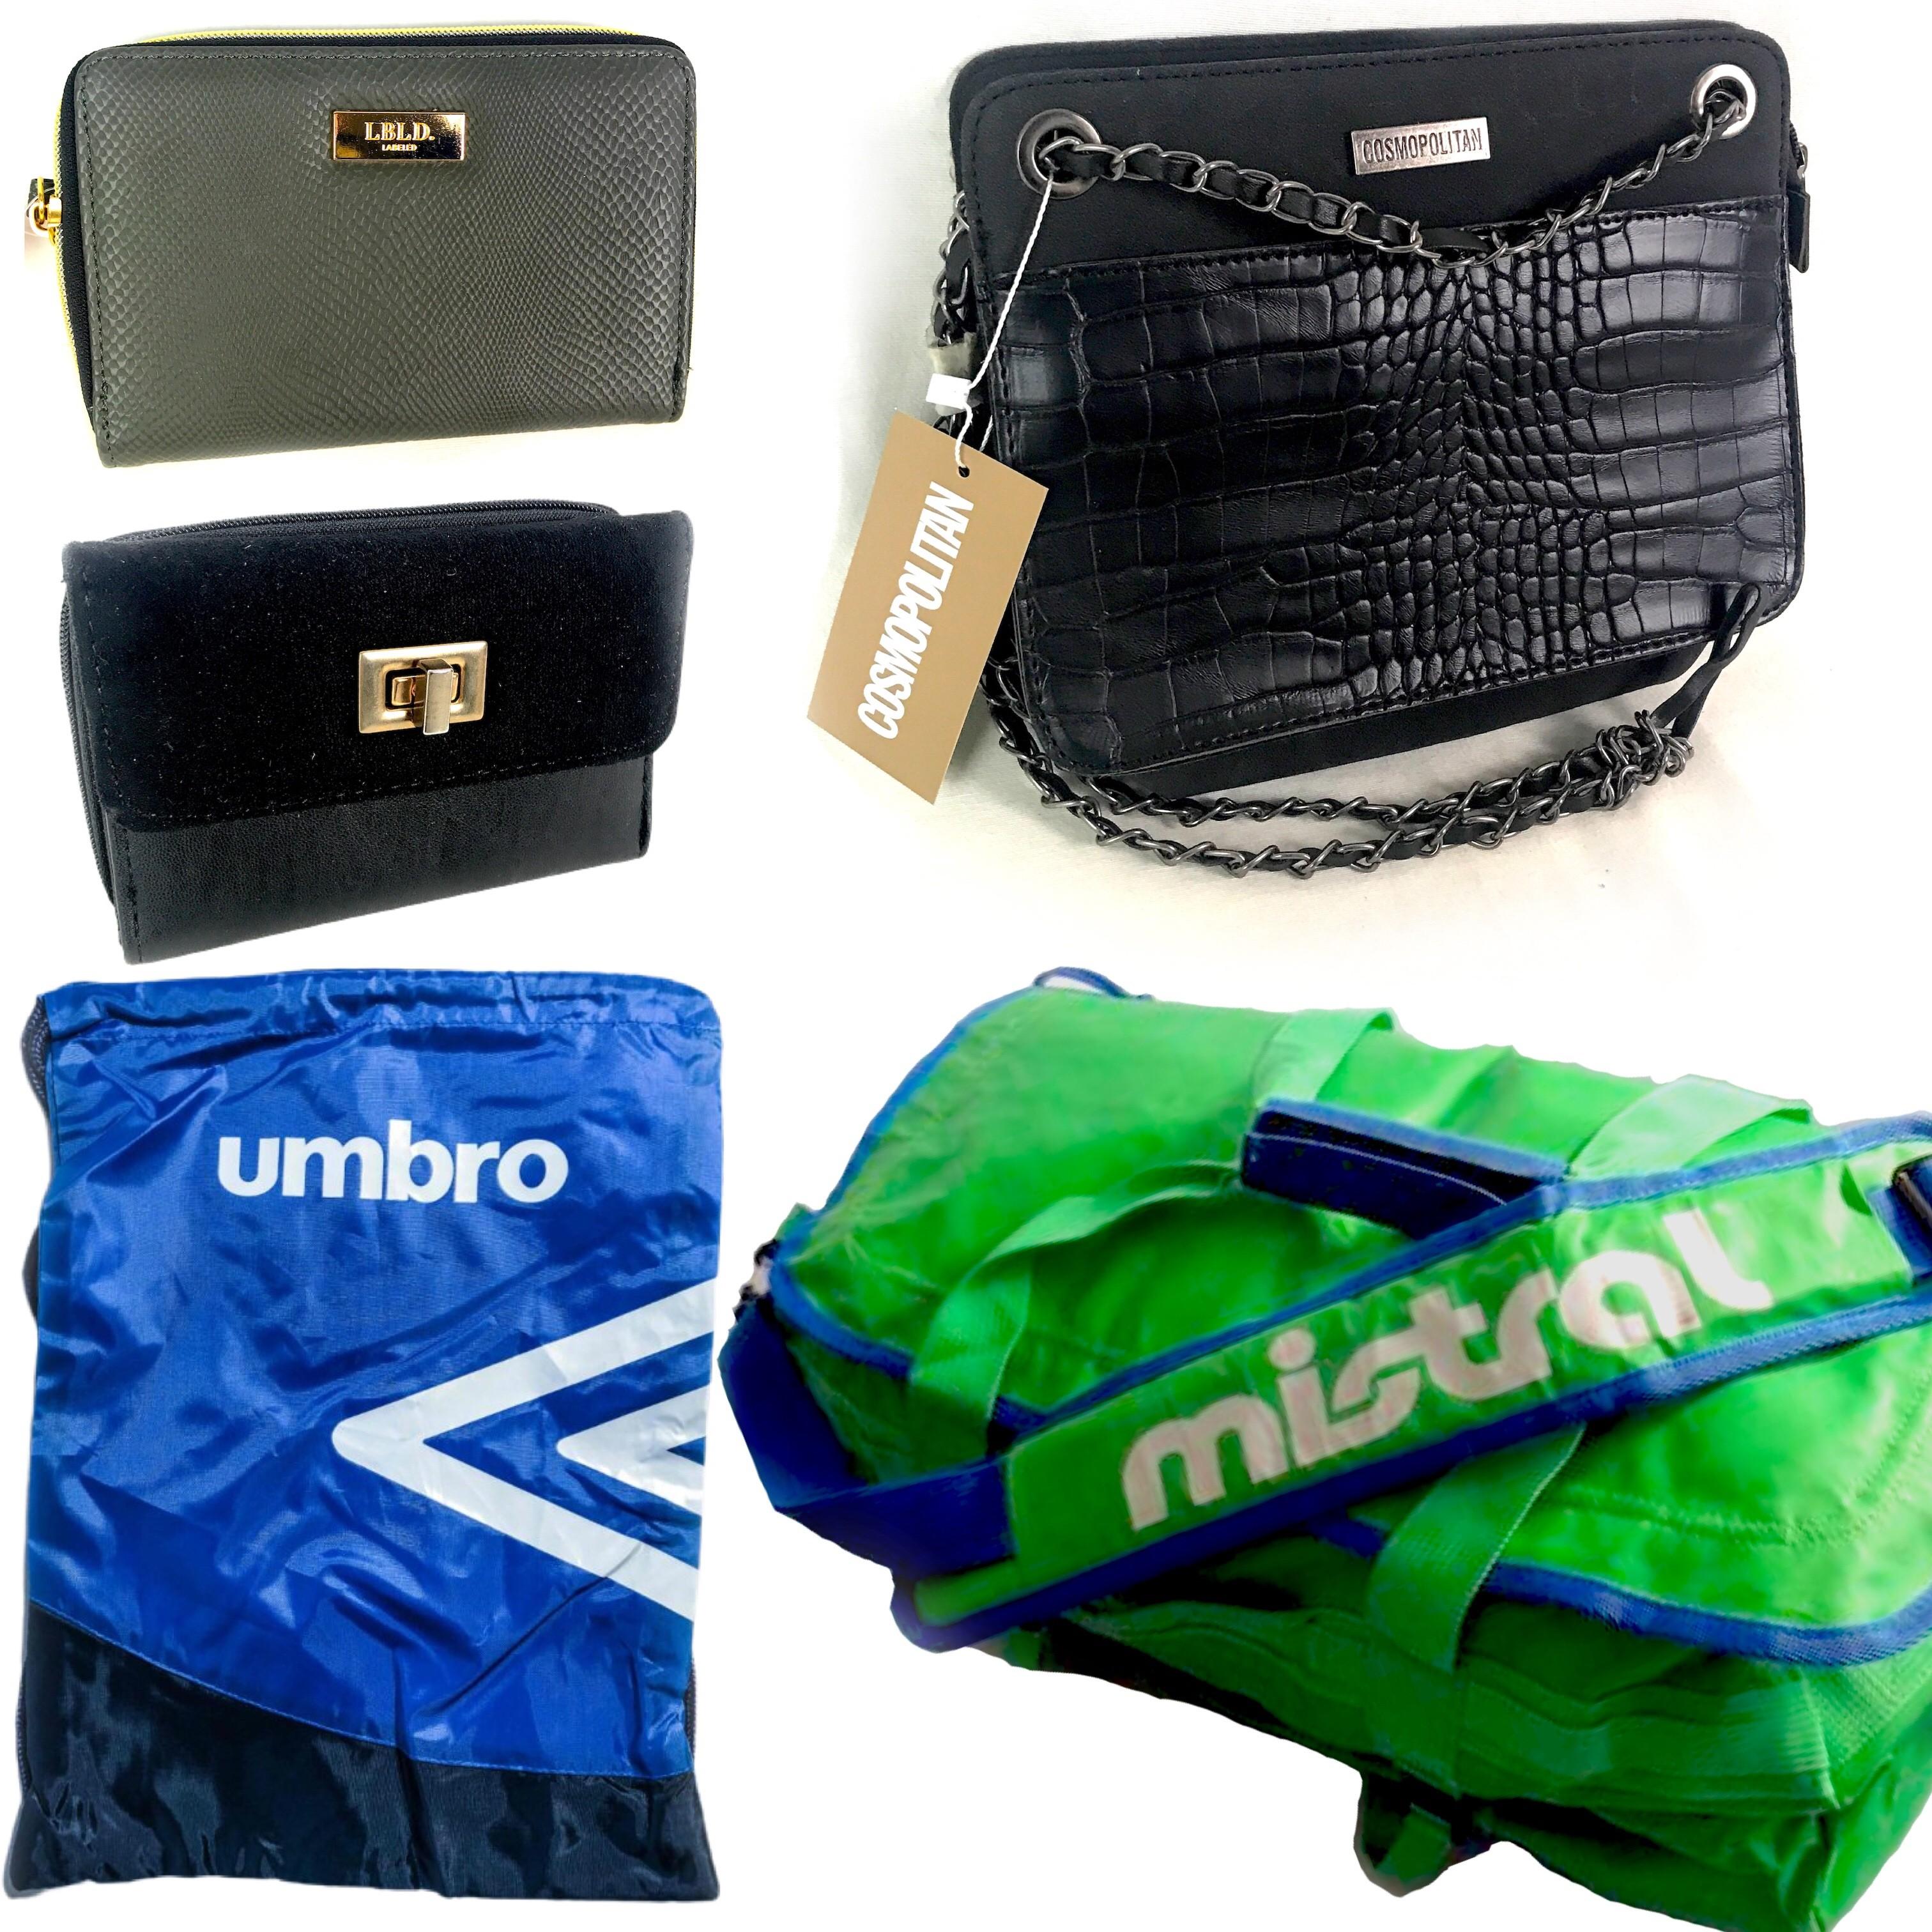 Mistral Bag, Umbro Sports Bag, Cosmopolitan Purses, LBLD Beauty Bags & More Est. Original Retail €5,494, Vilnius, LT